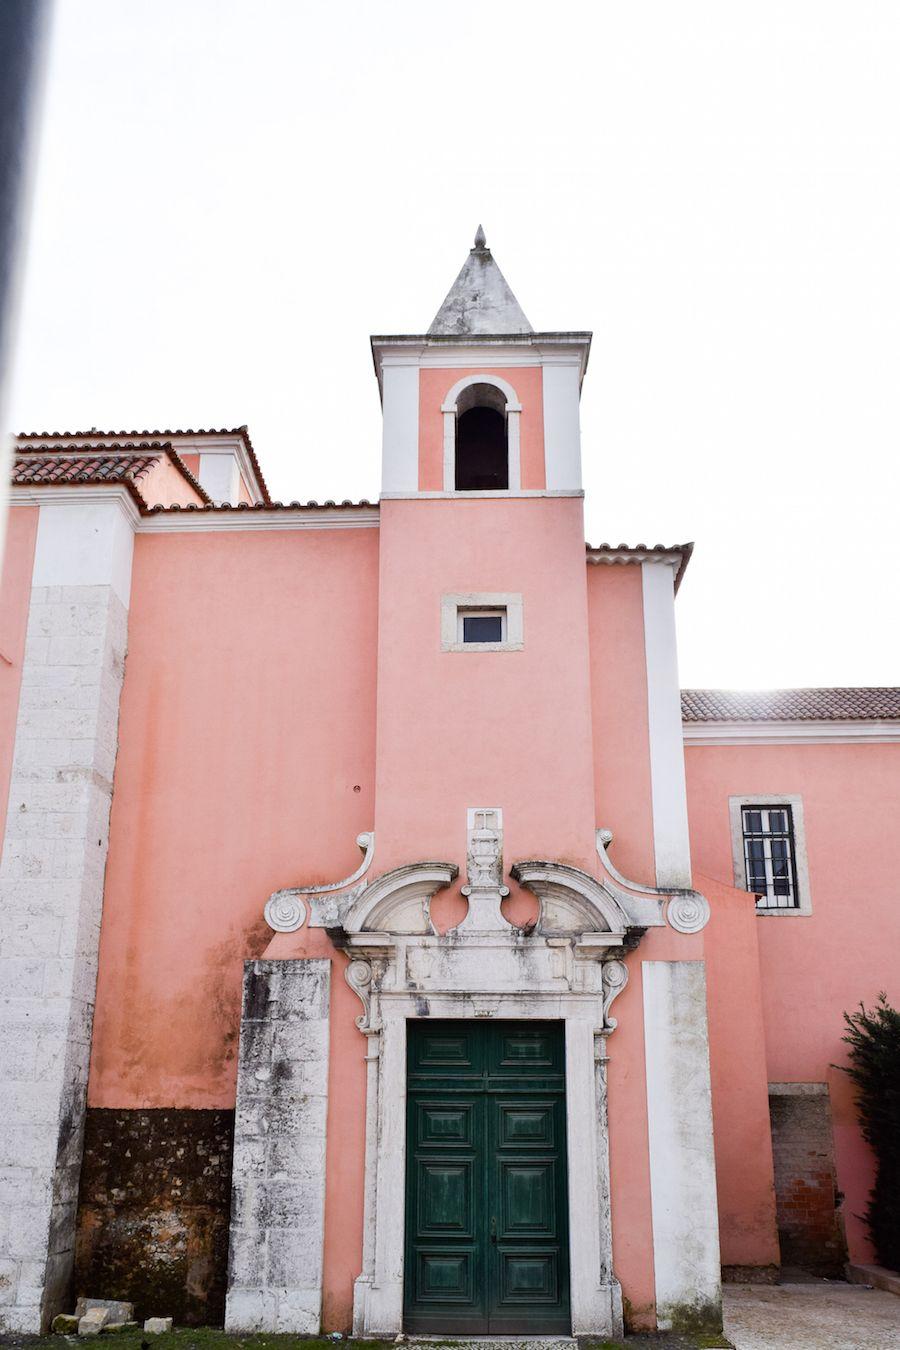 Pink Building East of Lisbon, Portugal